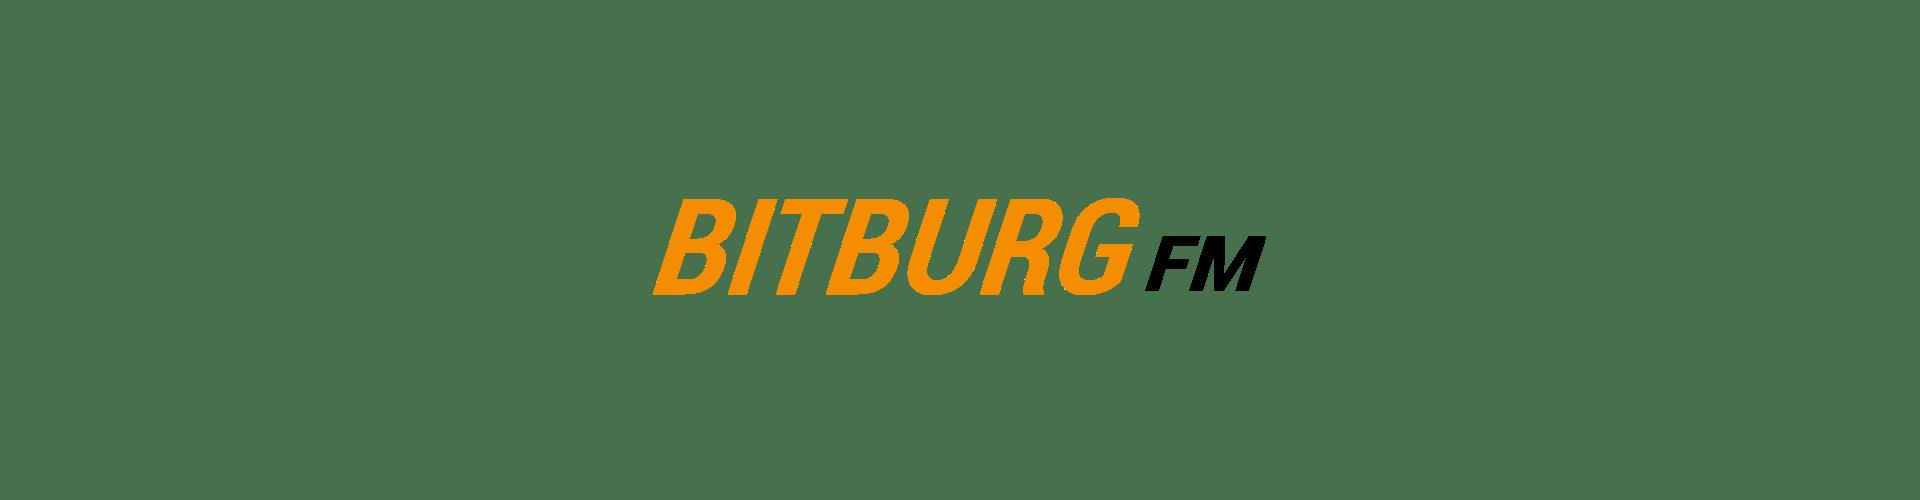 Bitburg FM